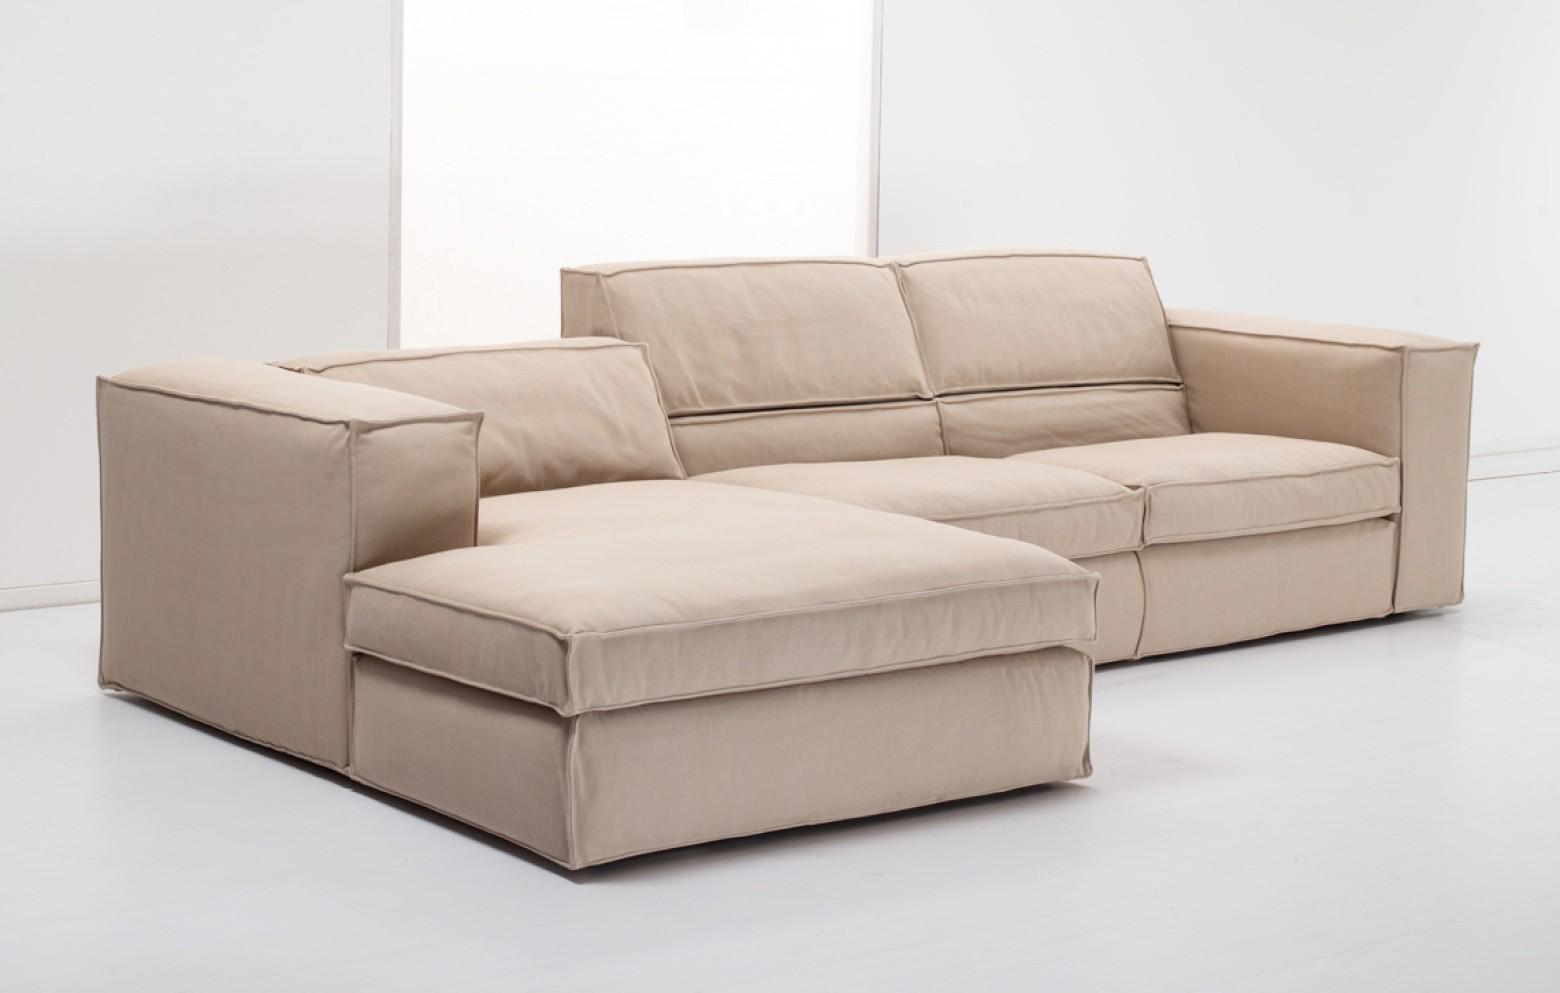 up eckkombination ecksofas polsterm bel who 39 s perfect. Black Bedroom Furniture Sets. Home Design Ideas